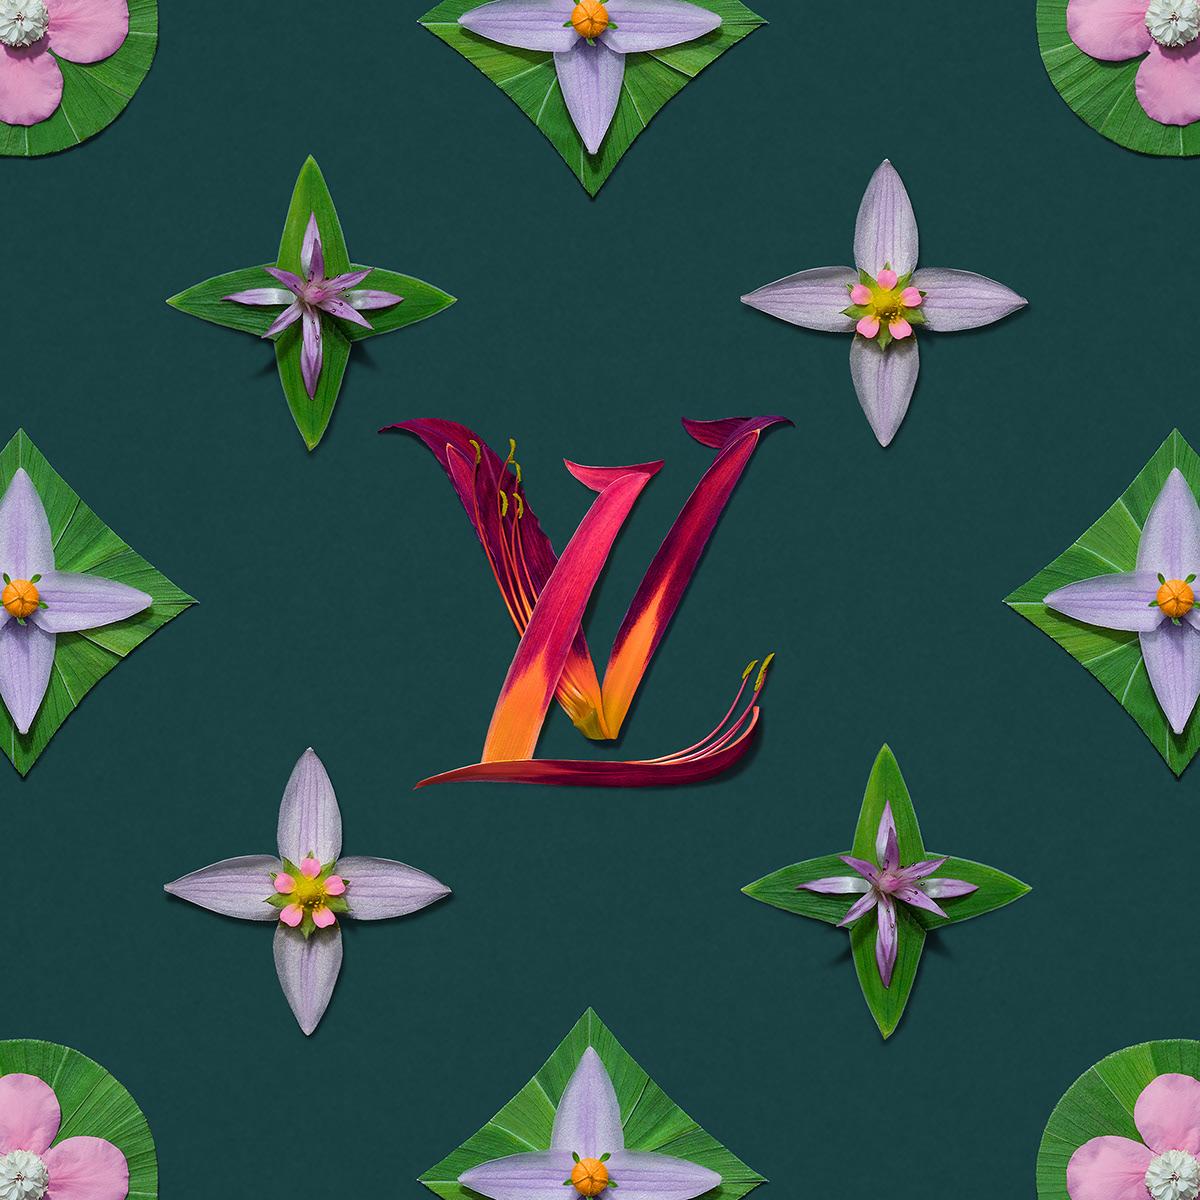 art colour creative design Fashion  floral Nature Patterns Photography